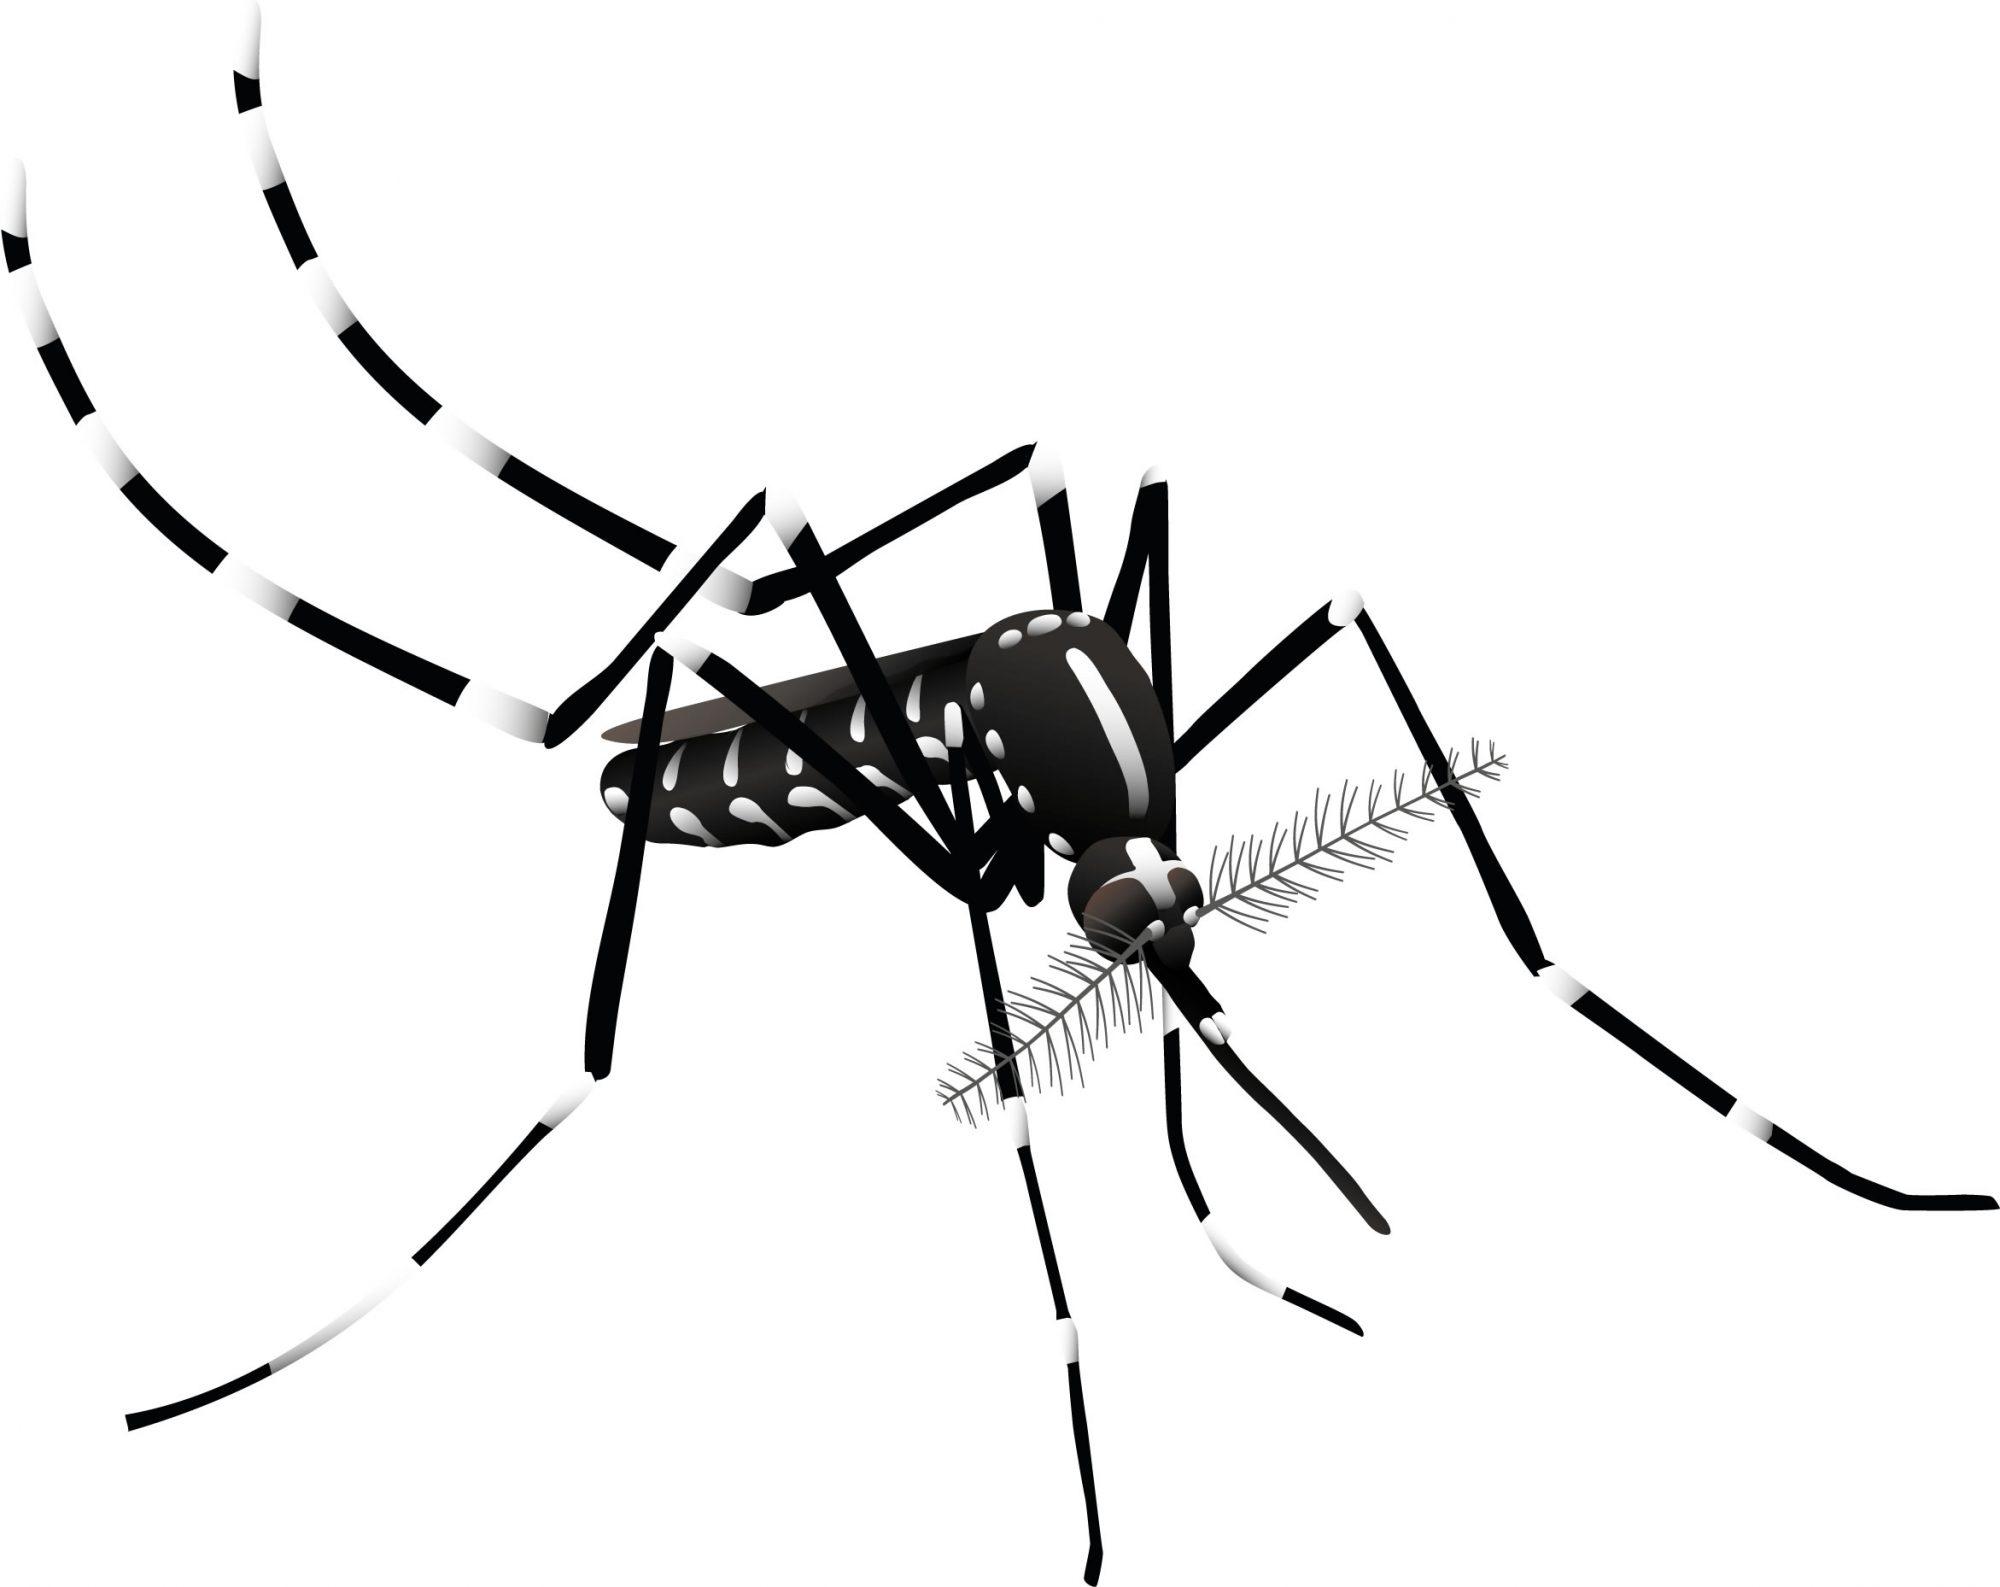 Aedes_albopictus_Lateral (1) Jose Luis Ordóñez (CC BY NC)